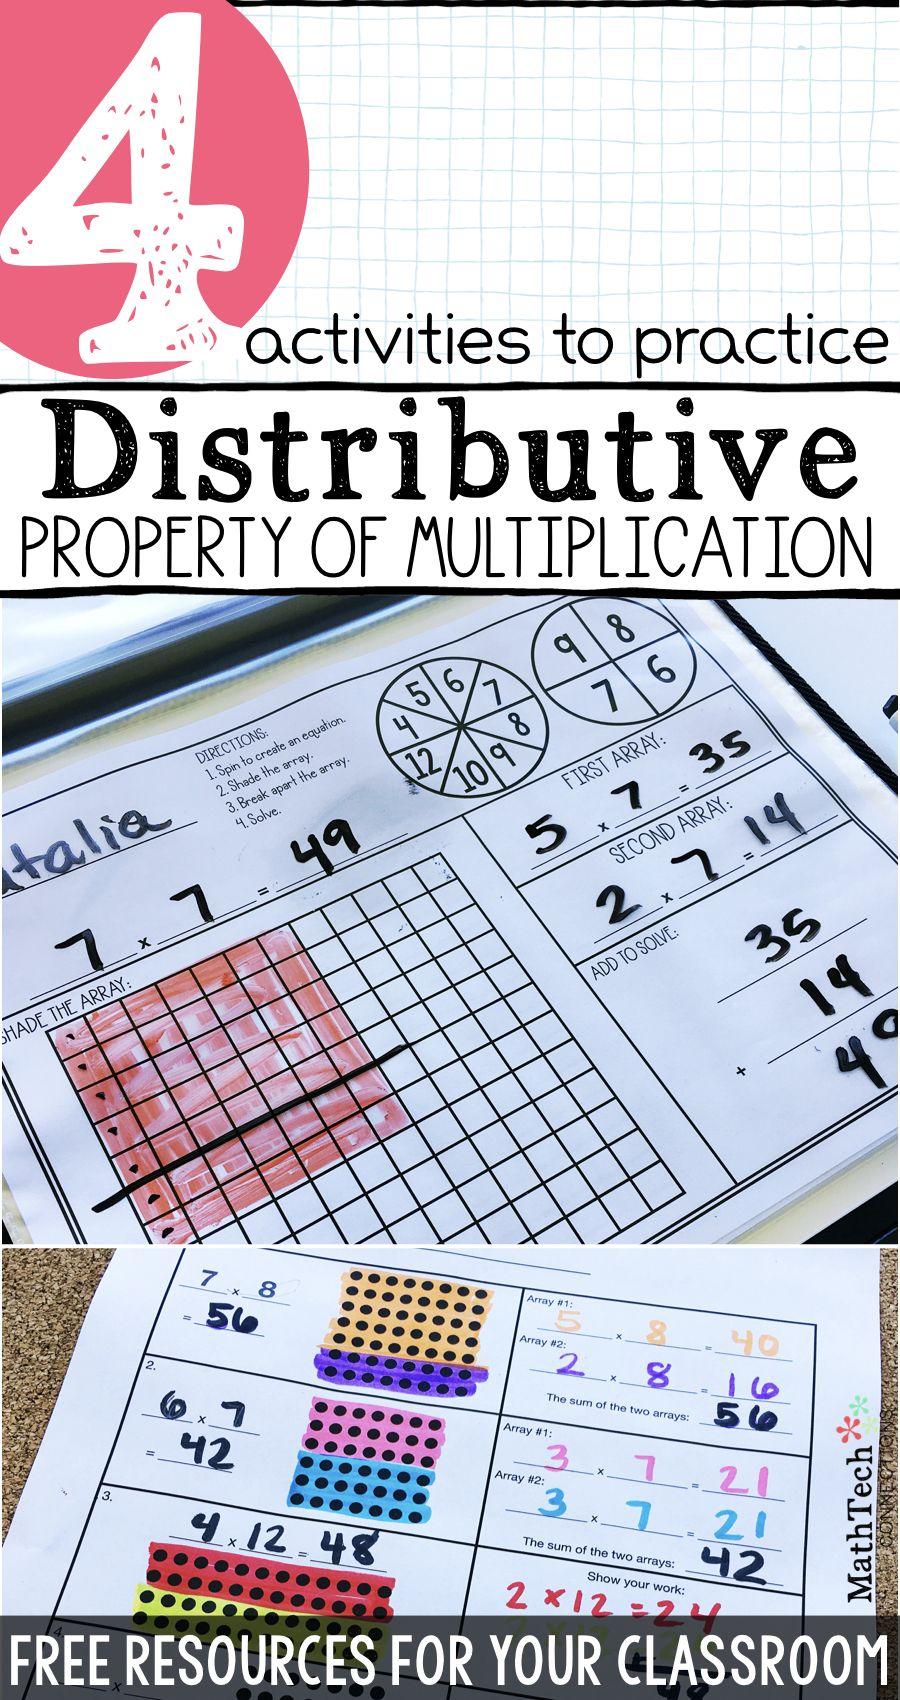 Distributive Property Of Multiplication - Free Printables